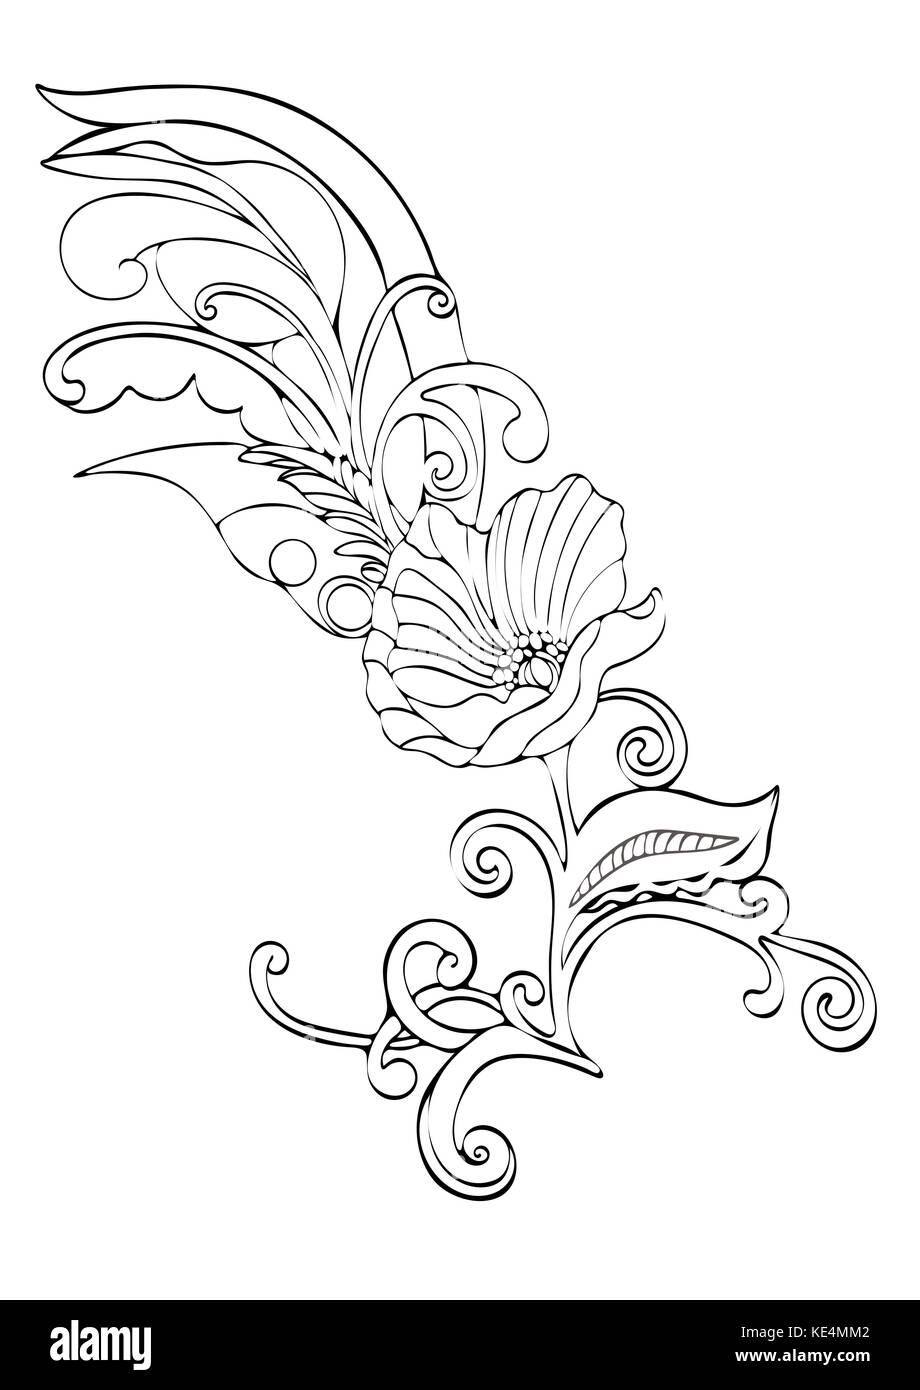 Cartoon poppy flower stock photos cartoon poppy flower stock abstract flower cartoon vector black and white contour hand drawn outline monochrome illustration mightylinksfo